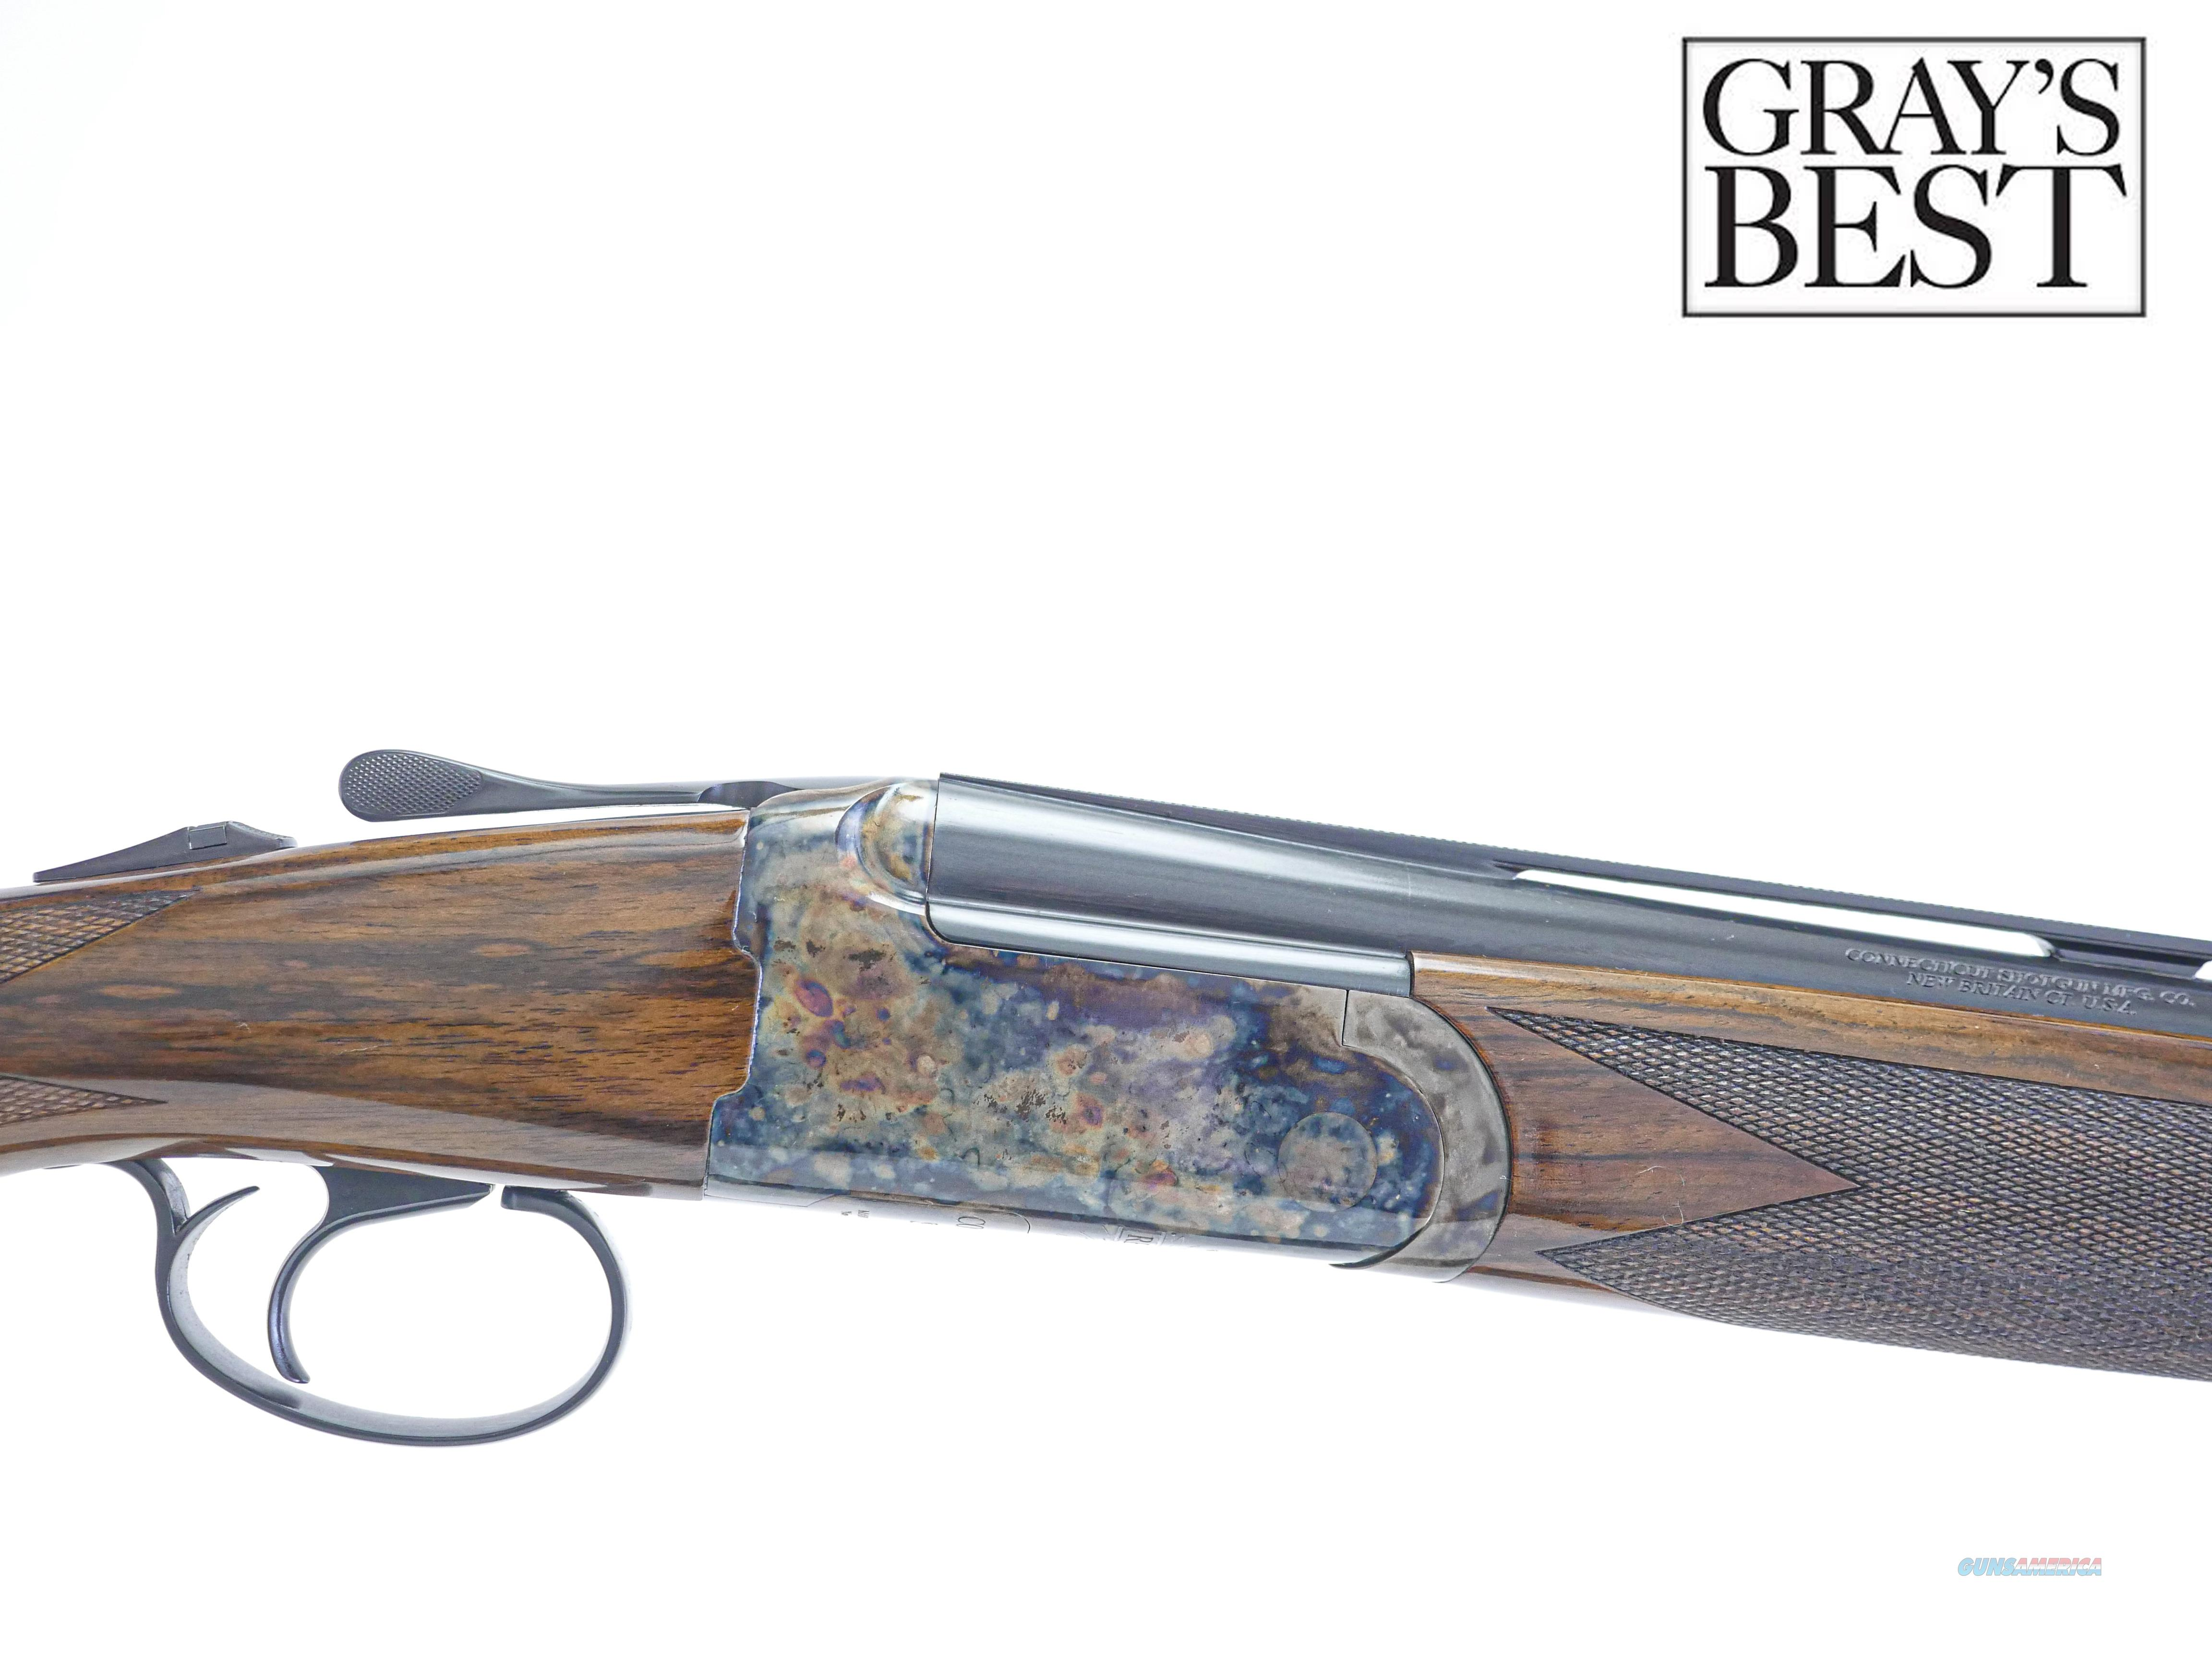 "CSMC - Revelation, 20ga. 26"" Barrels with 5 Screw-in Choke Tubes. #43008  Guns > Shotguns > Connecticut (Galazan) Shotguns"